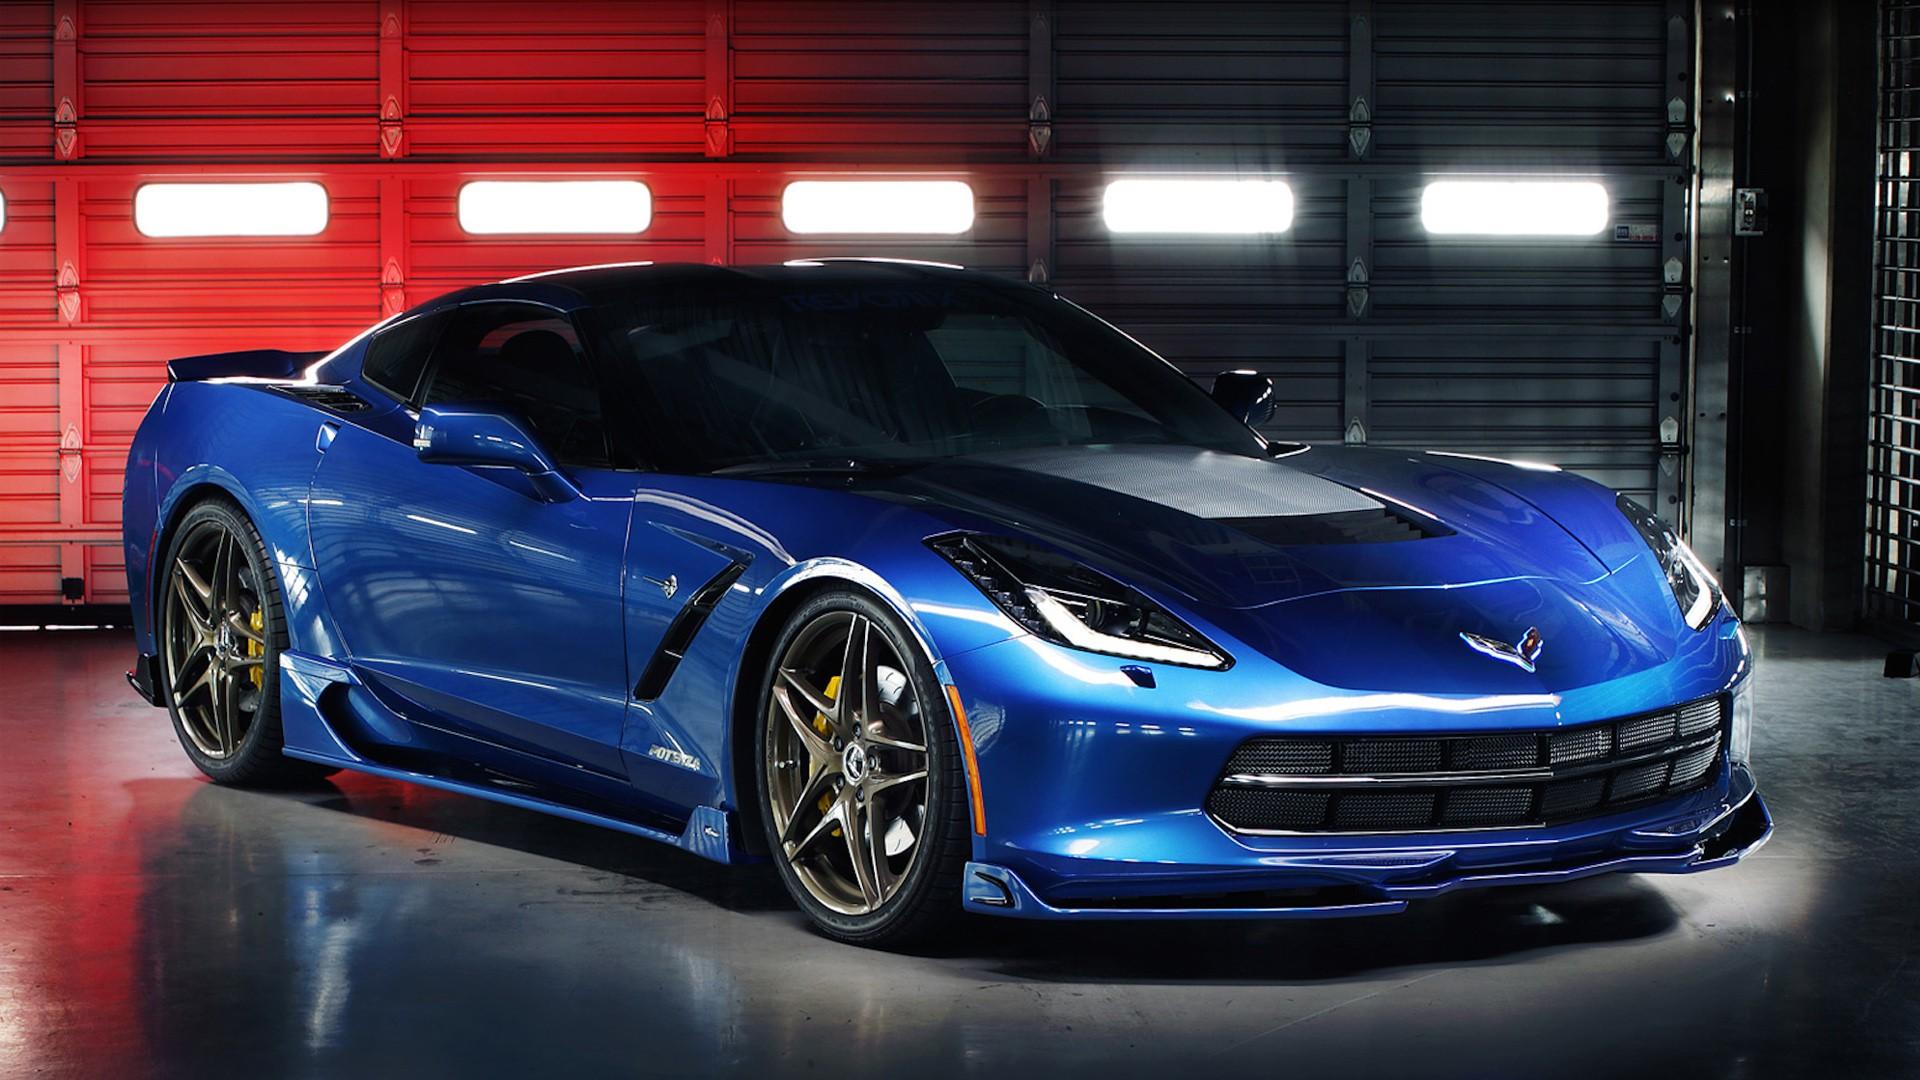 2014 Revorix Chevrolet Corvette Wallpaper Hd Car